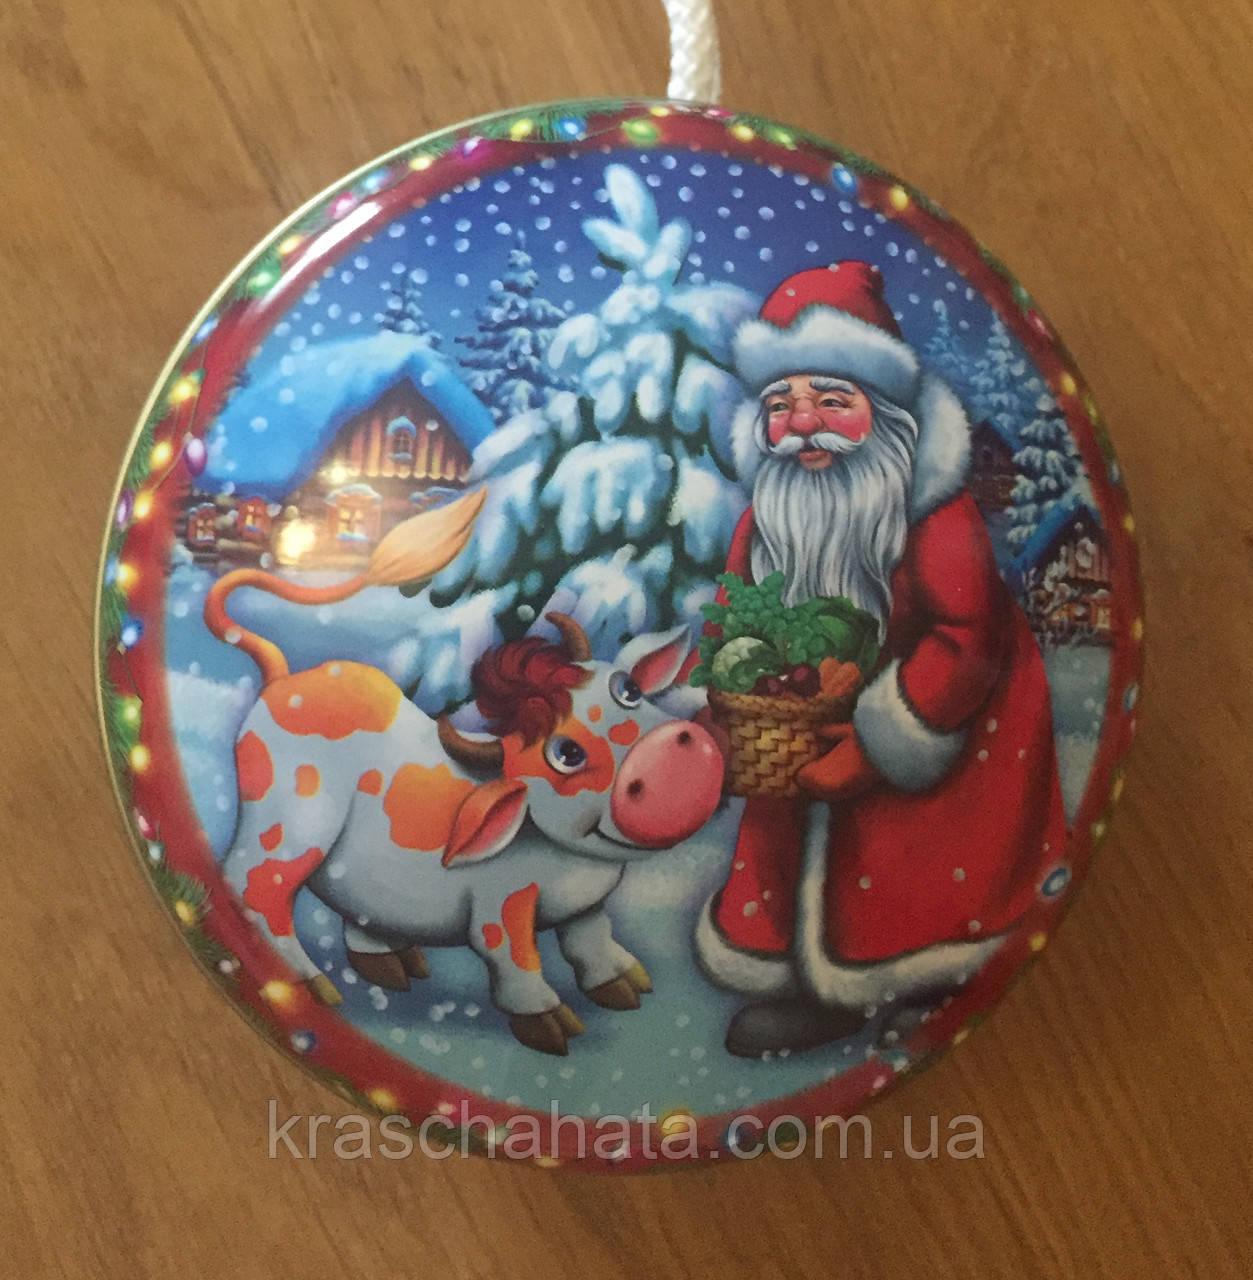 Новогодняя коробка, Дед Мороз, 10х4,5 см, Жестяная упаковка для конфет, 100 гр, Круглая коробка для конфет